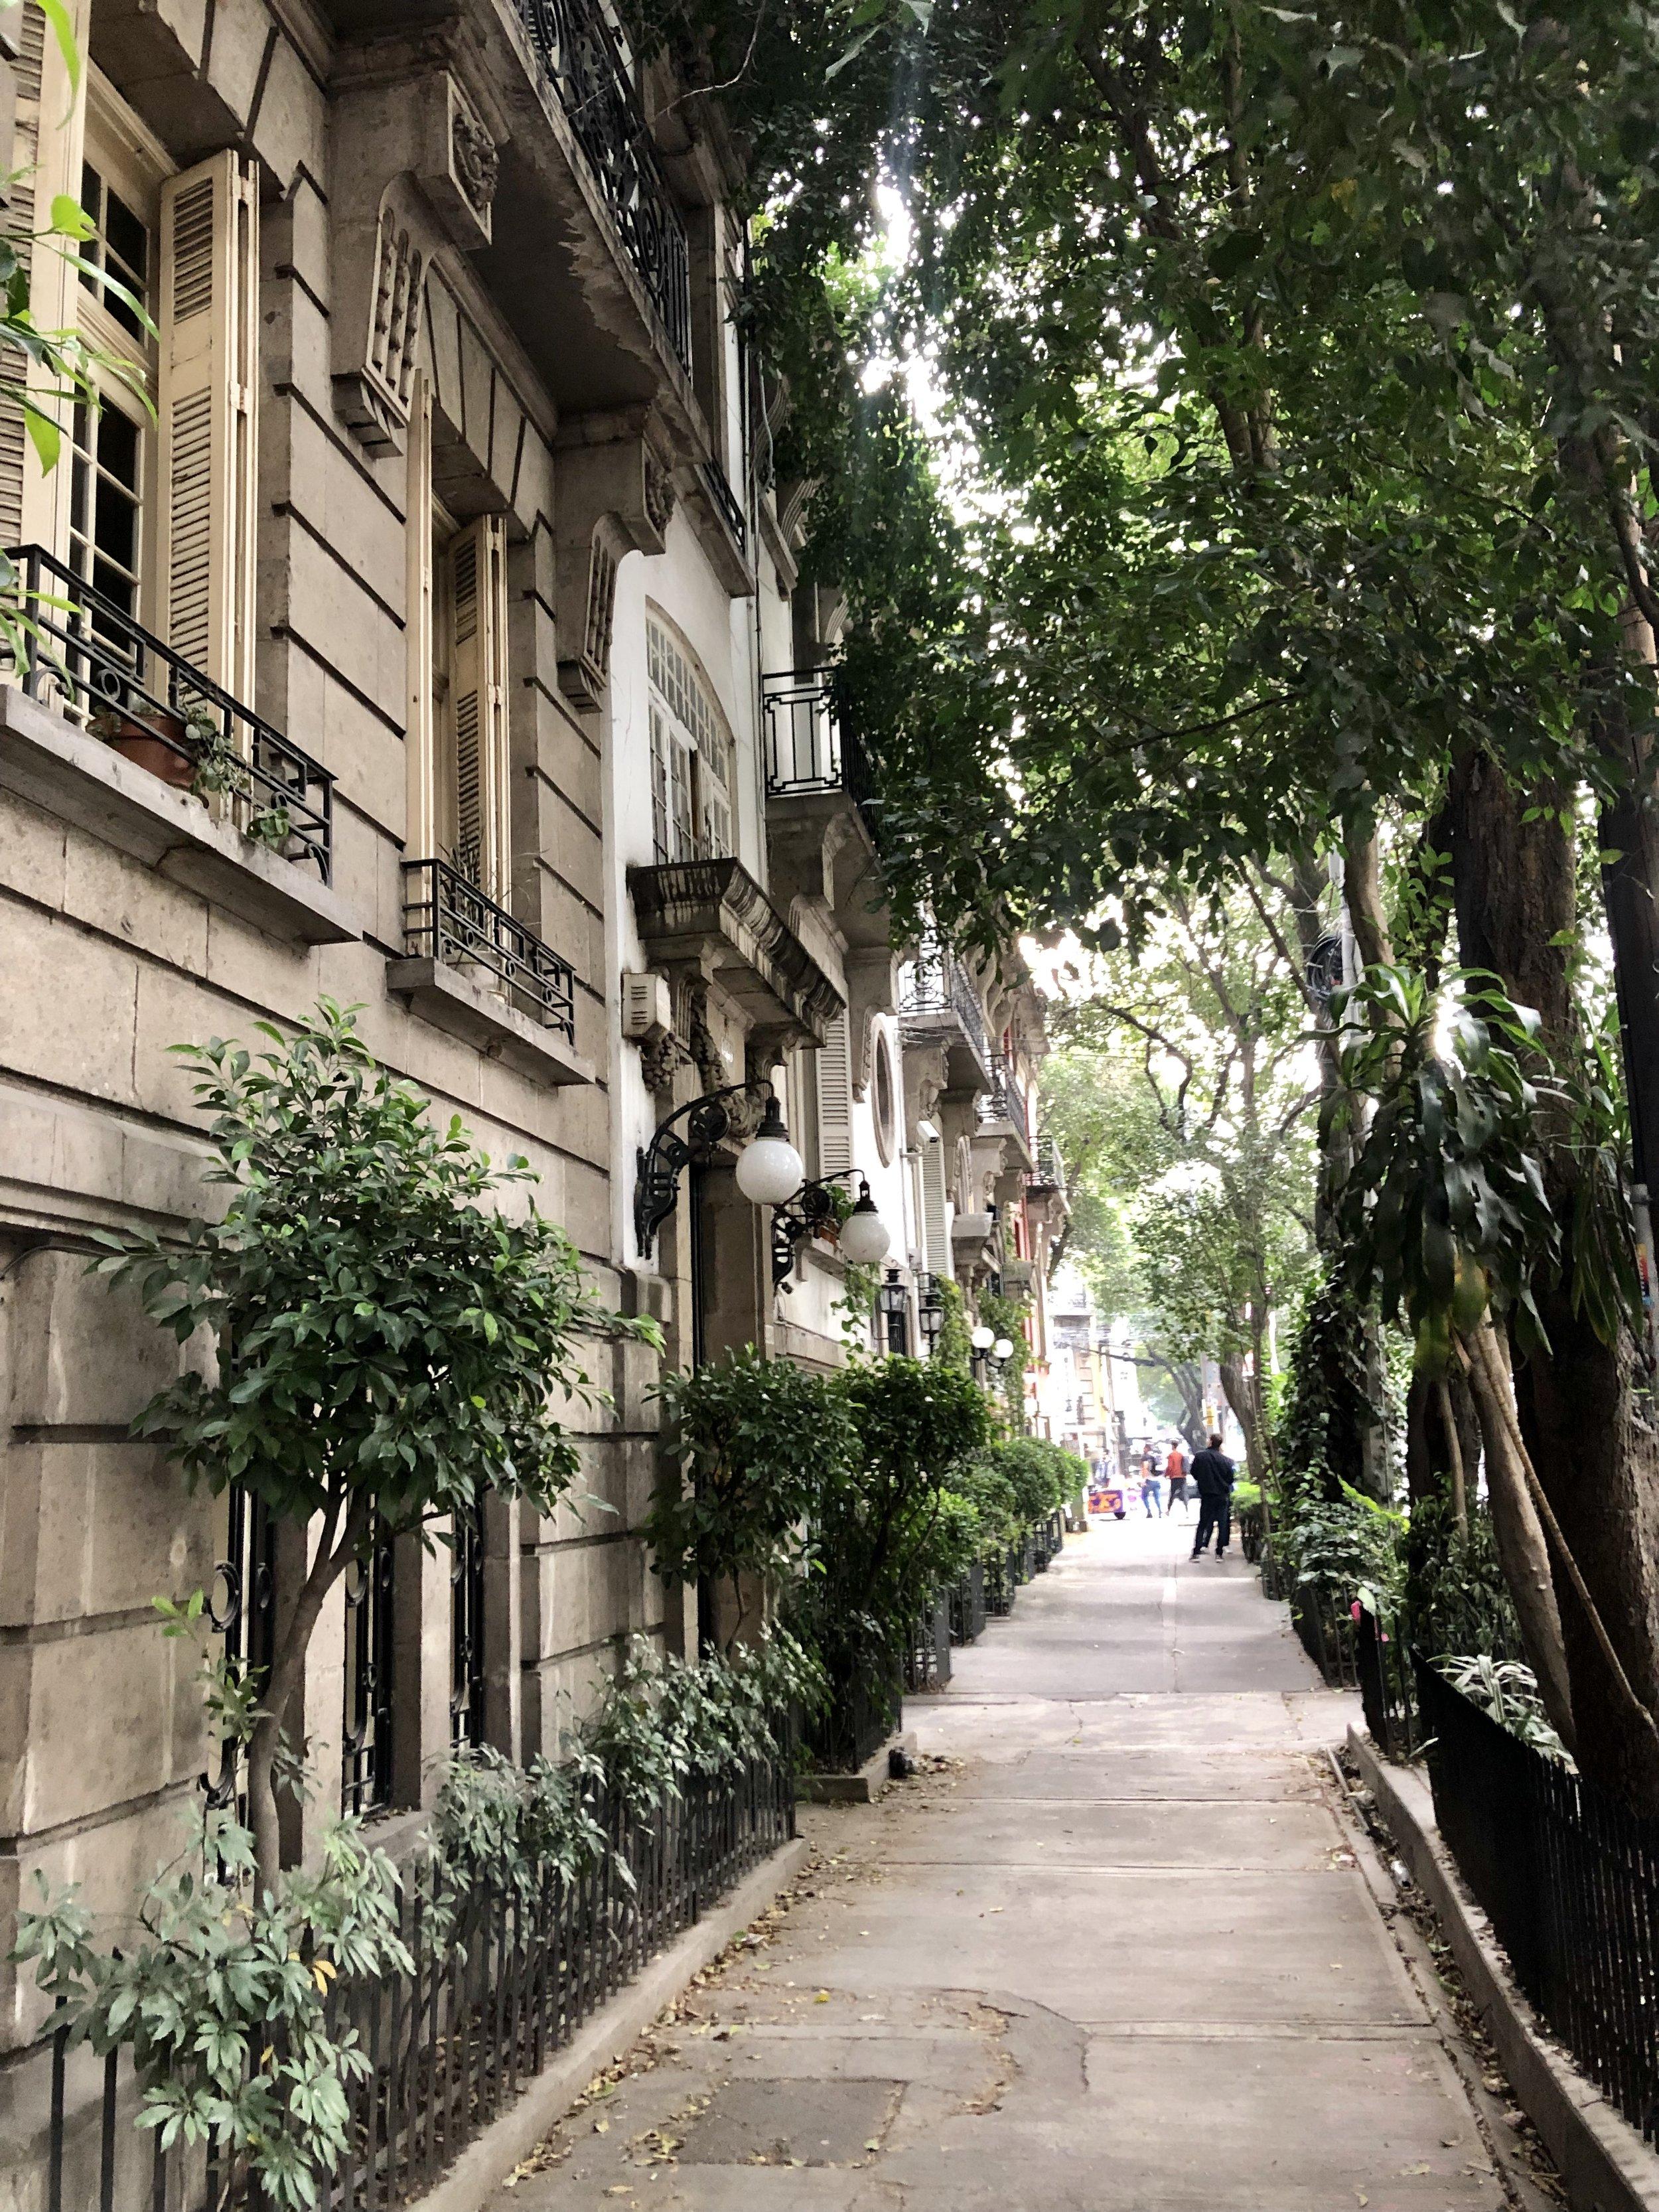 Roma Norte, Mexico City